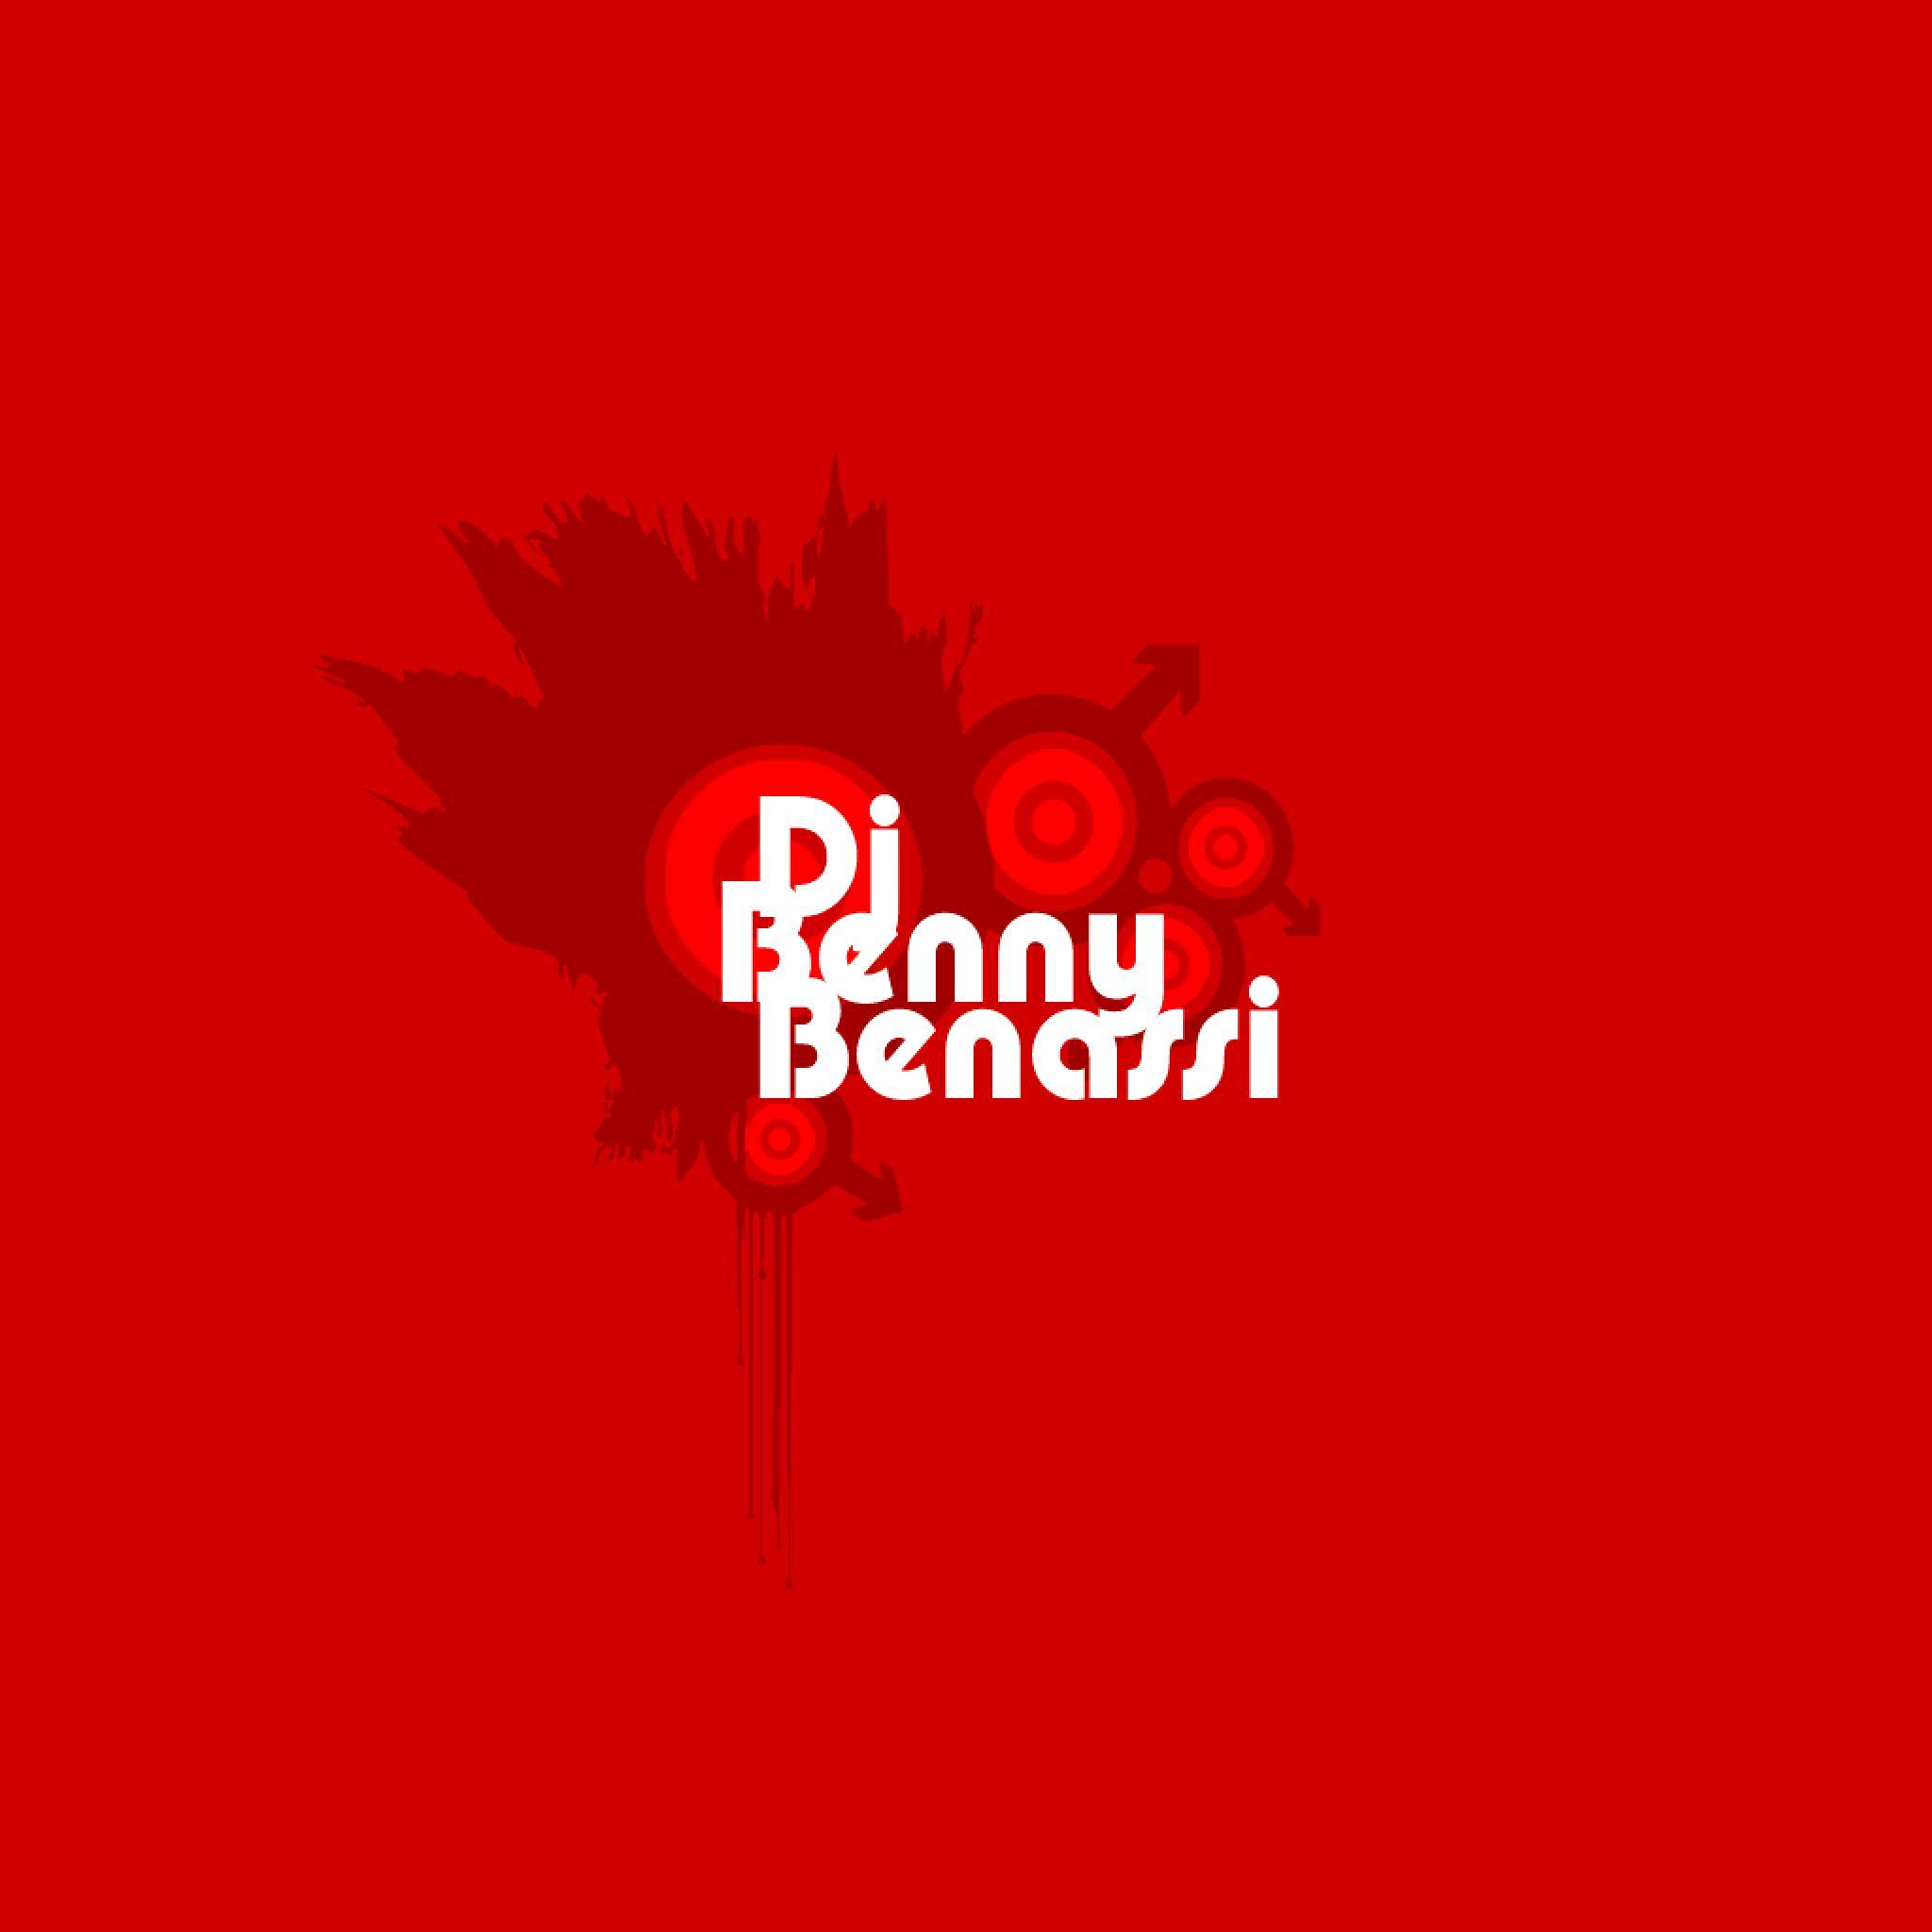 Music   Benny Benassi   iPad iPhone HD Wallpaper 2048x2048